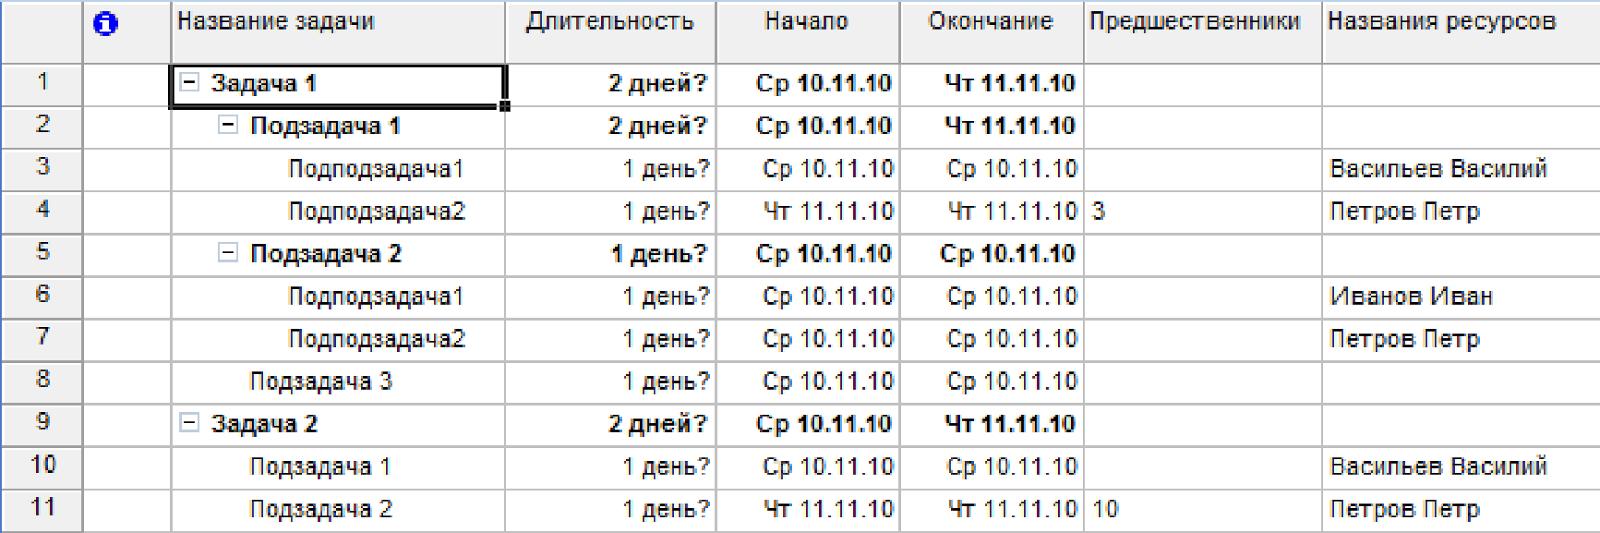 Задача по PHP + MySQL на собеседование